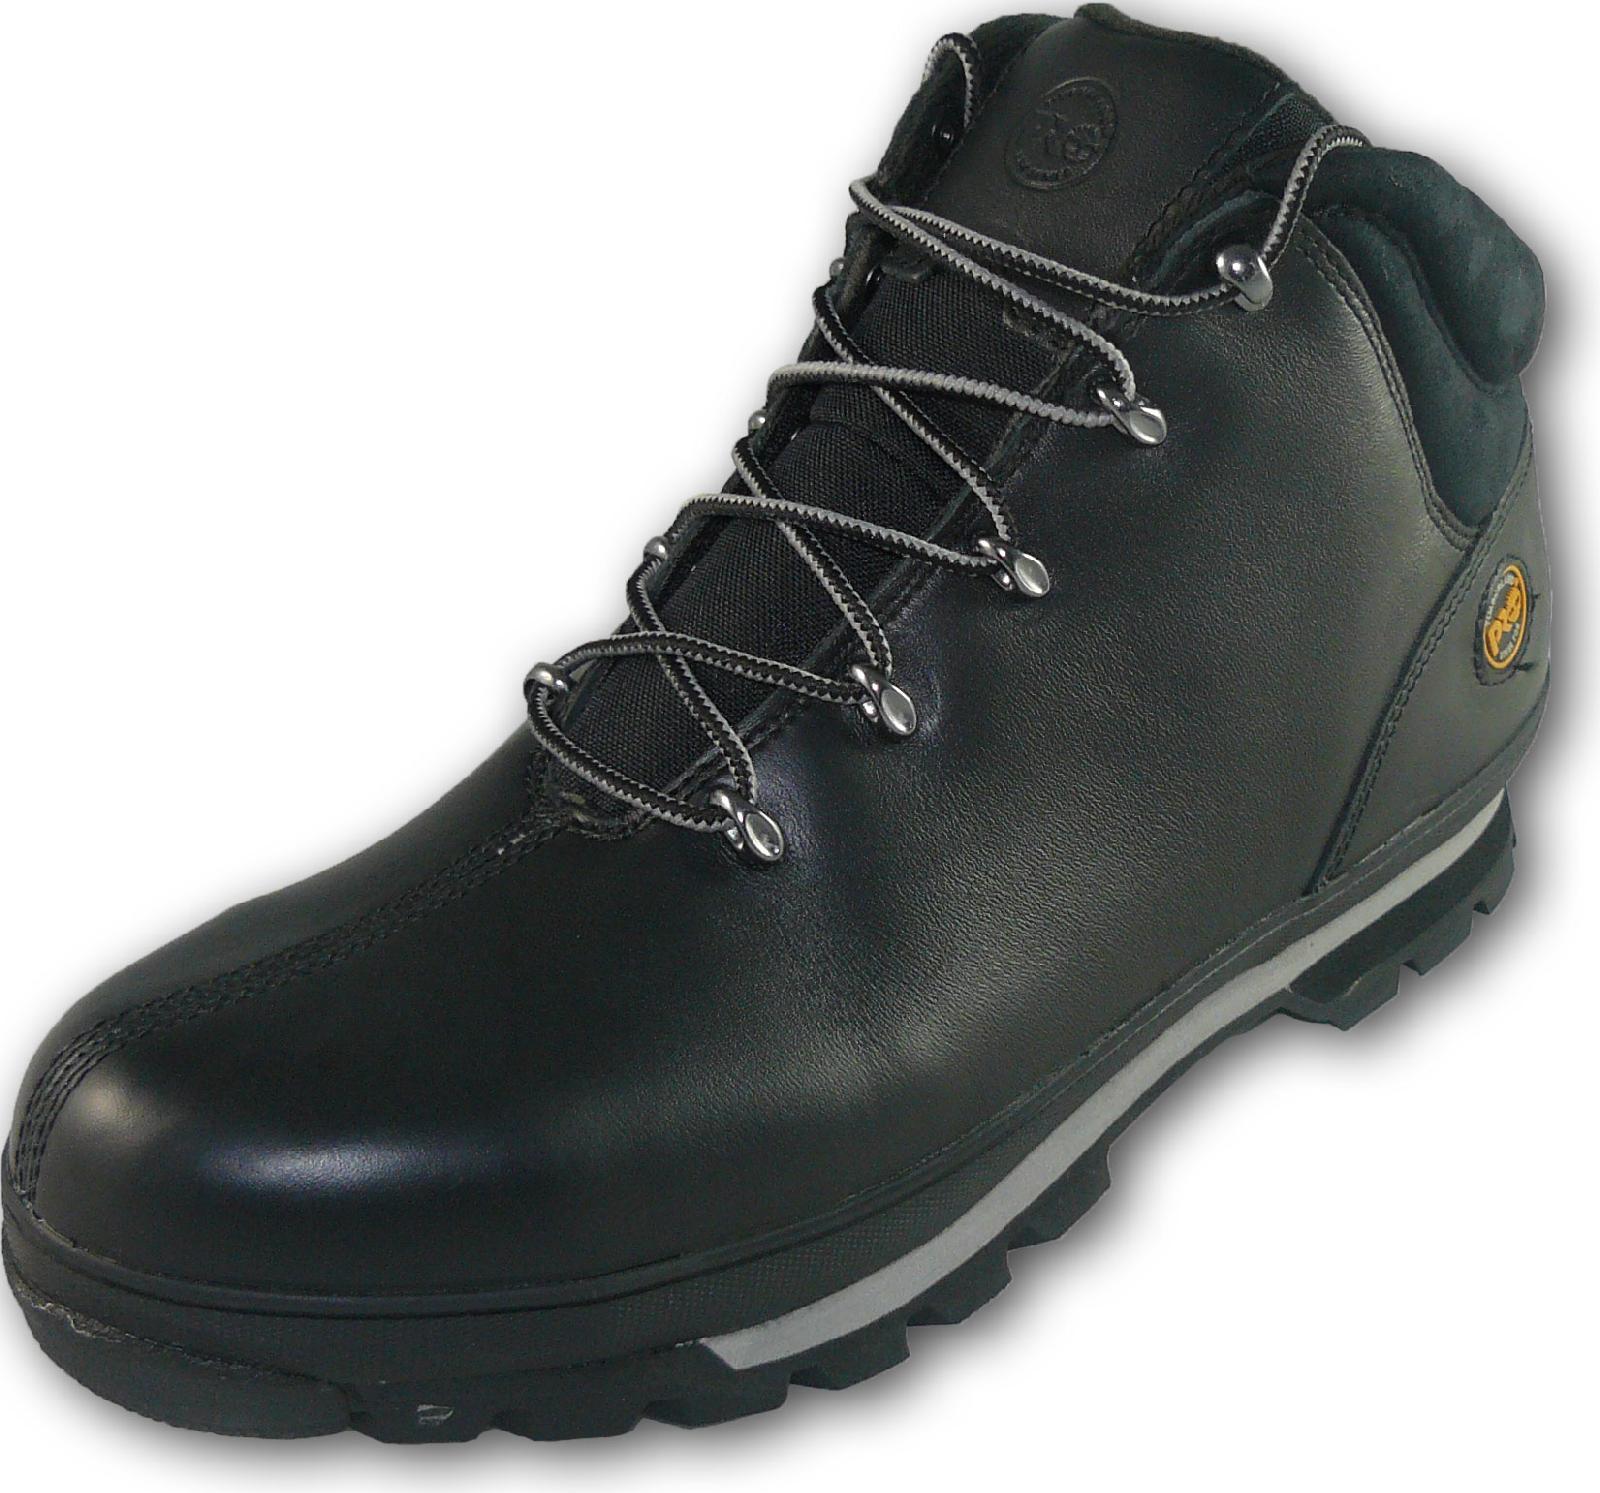 Timberland Pro Steel Toe Work Safety Boots Splitrock